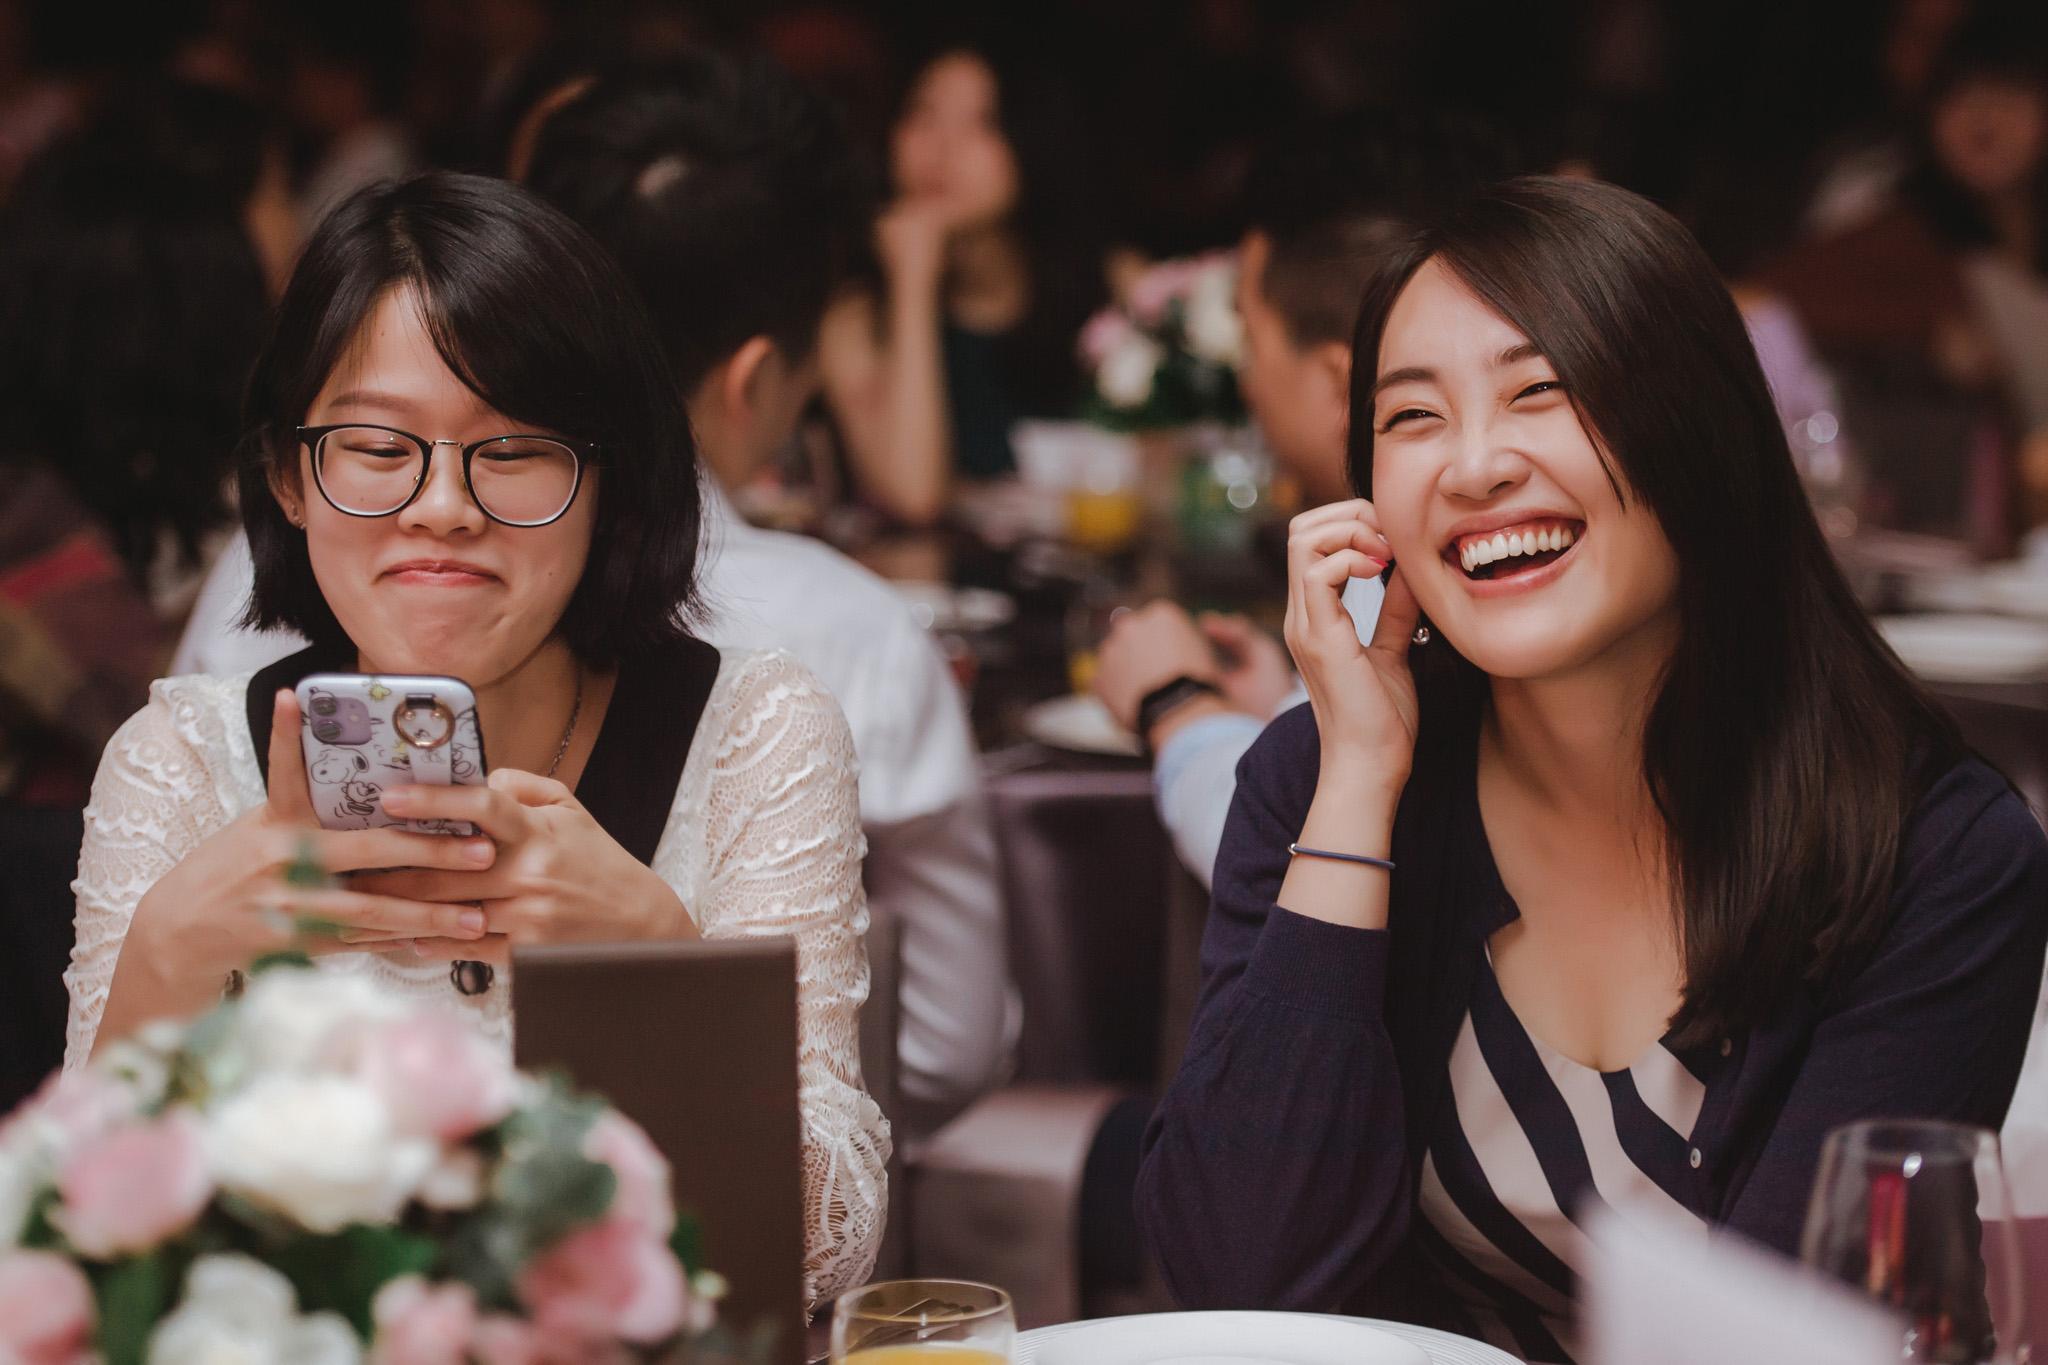 EW 居米 台北禮服 台北婚紗 台北婚攝 國泰萬怡 台北婚禮-24